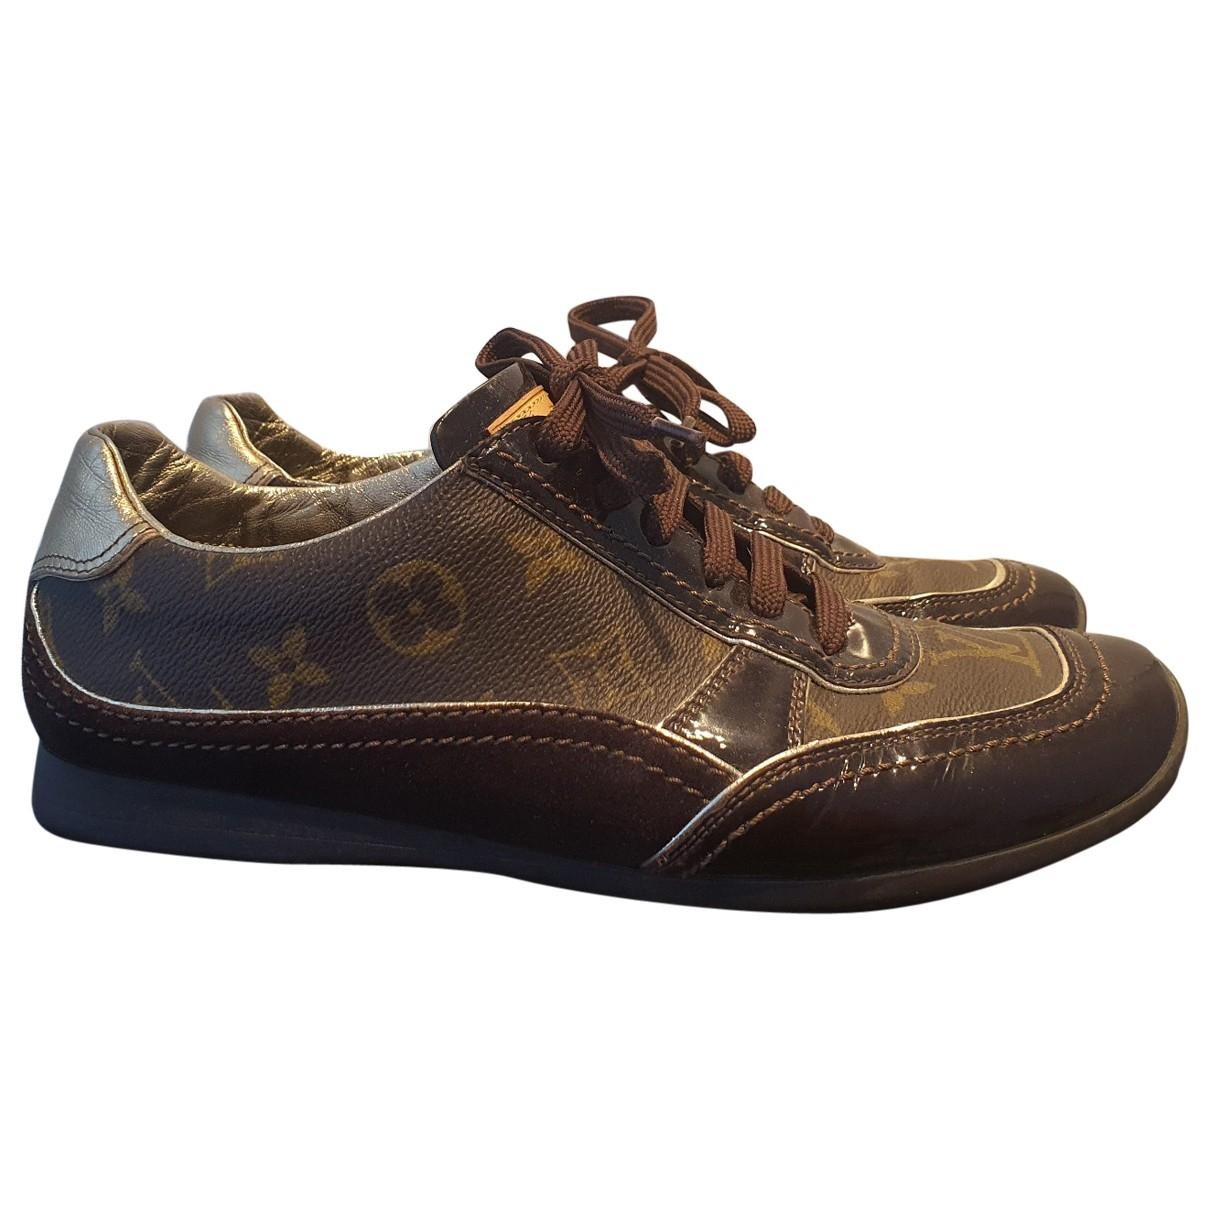 Louis Vuitton \N Sneakers in  Braun Leinen